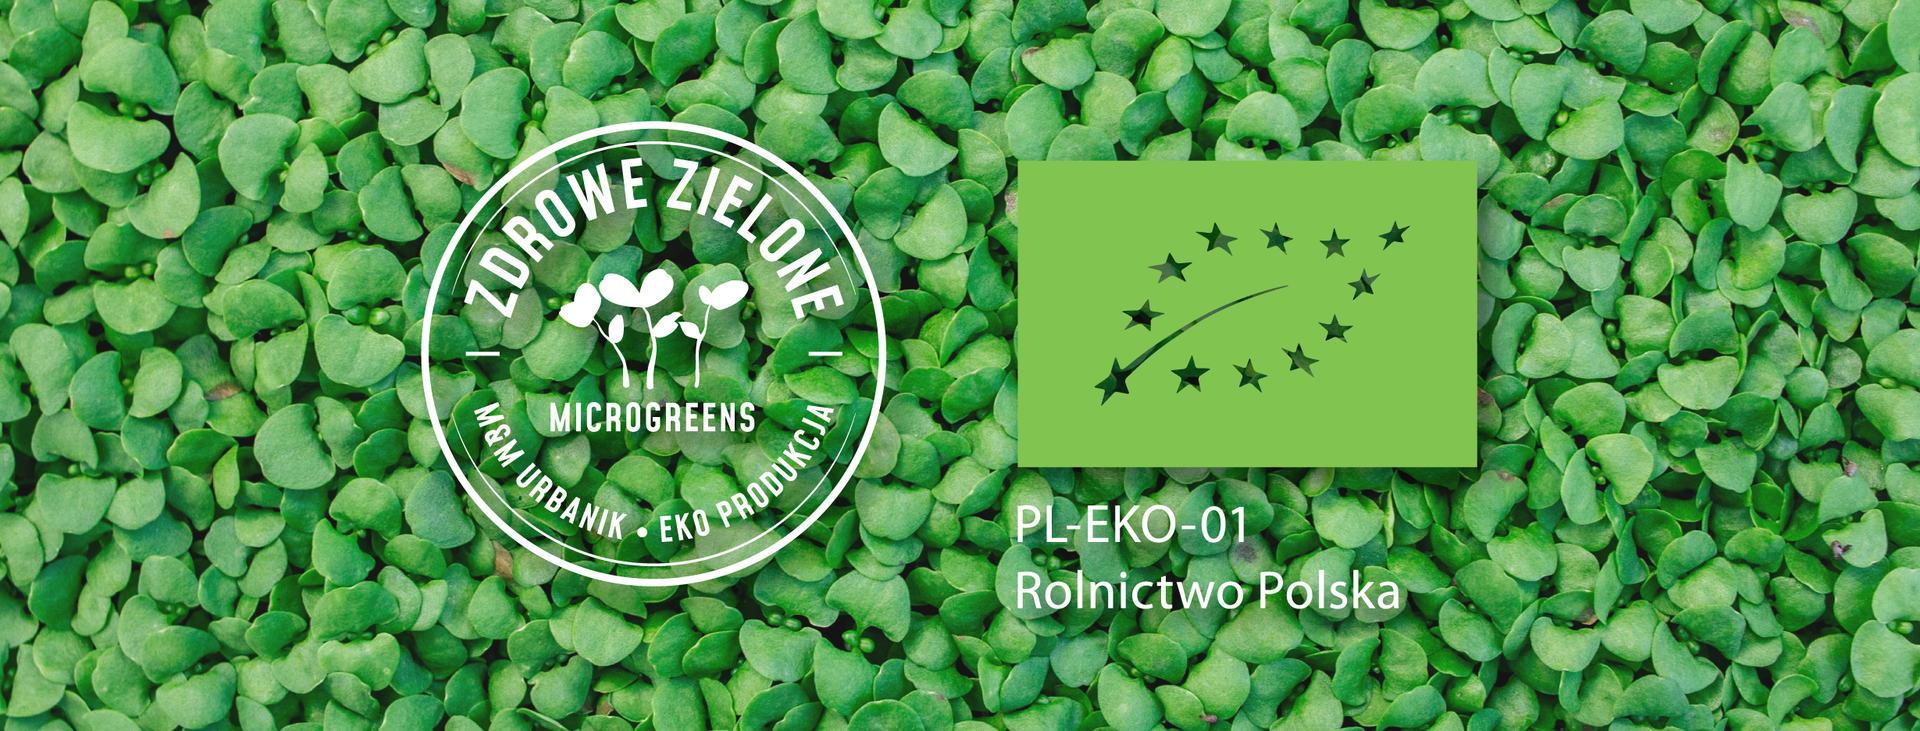 FB-zielone.jpg